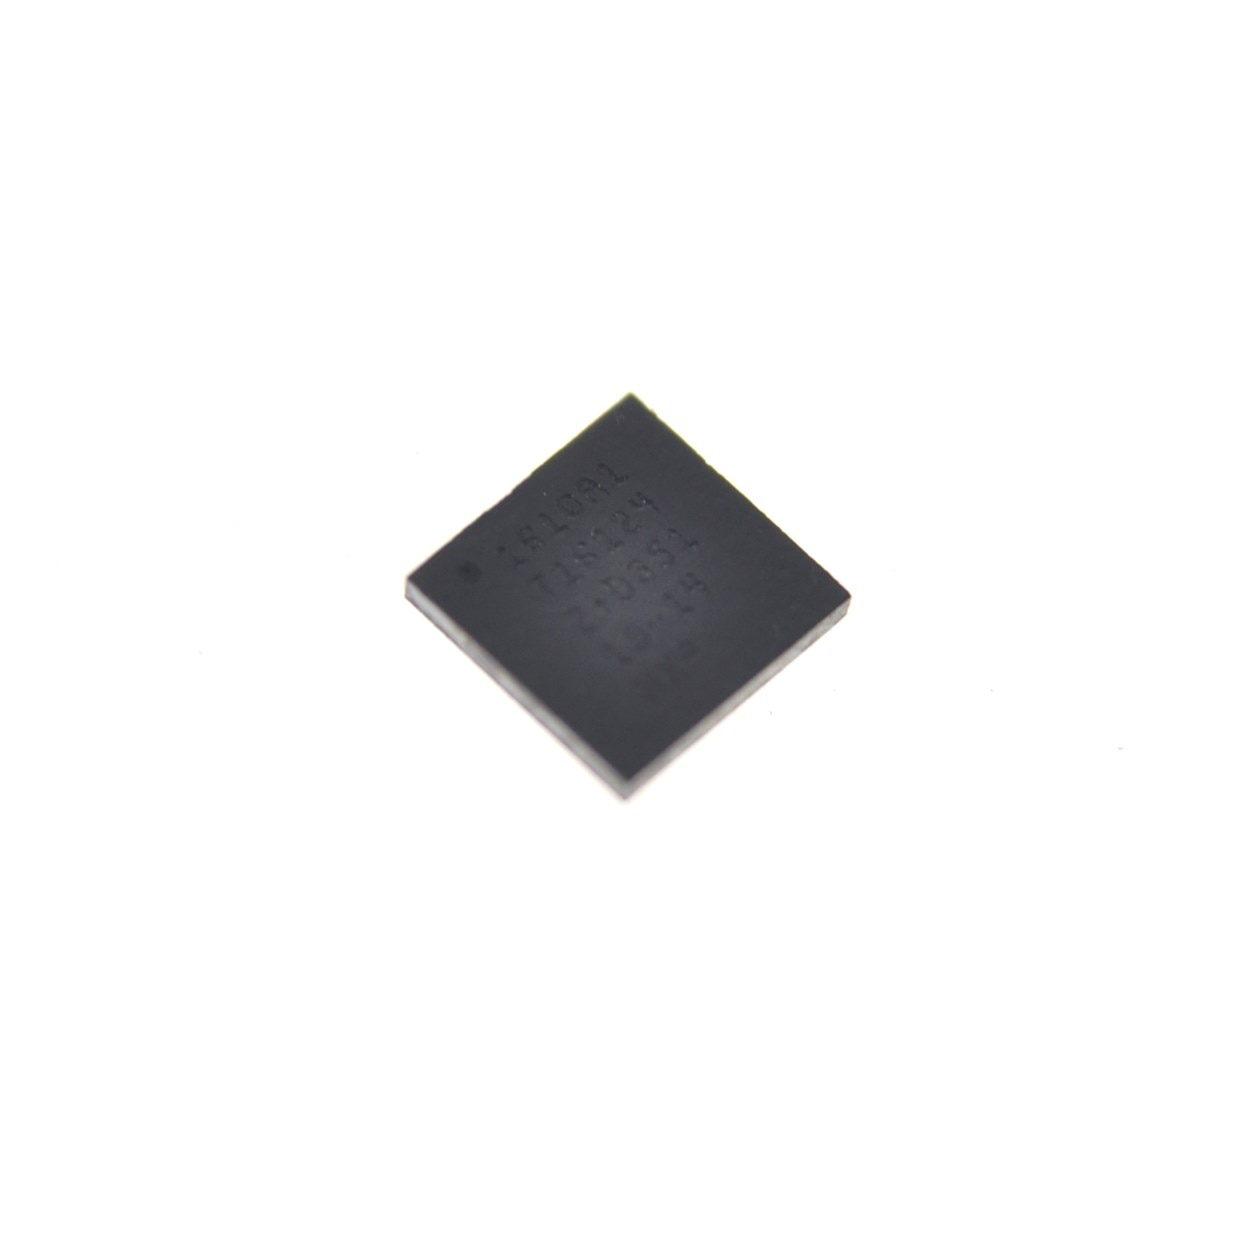 10 adet/grup 100% Orijinal Yeni şarj şarj ic çip iPhone 6 6G için 6 artı usb ic çip 1610 1610A 1610A2 36pin